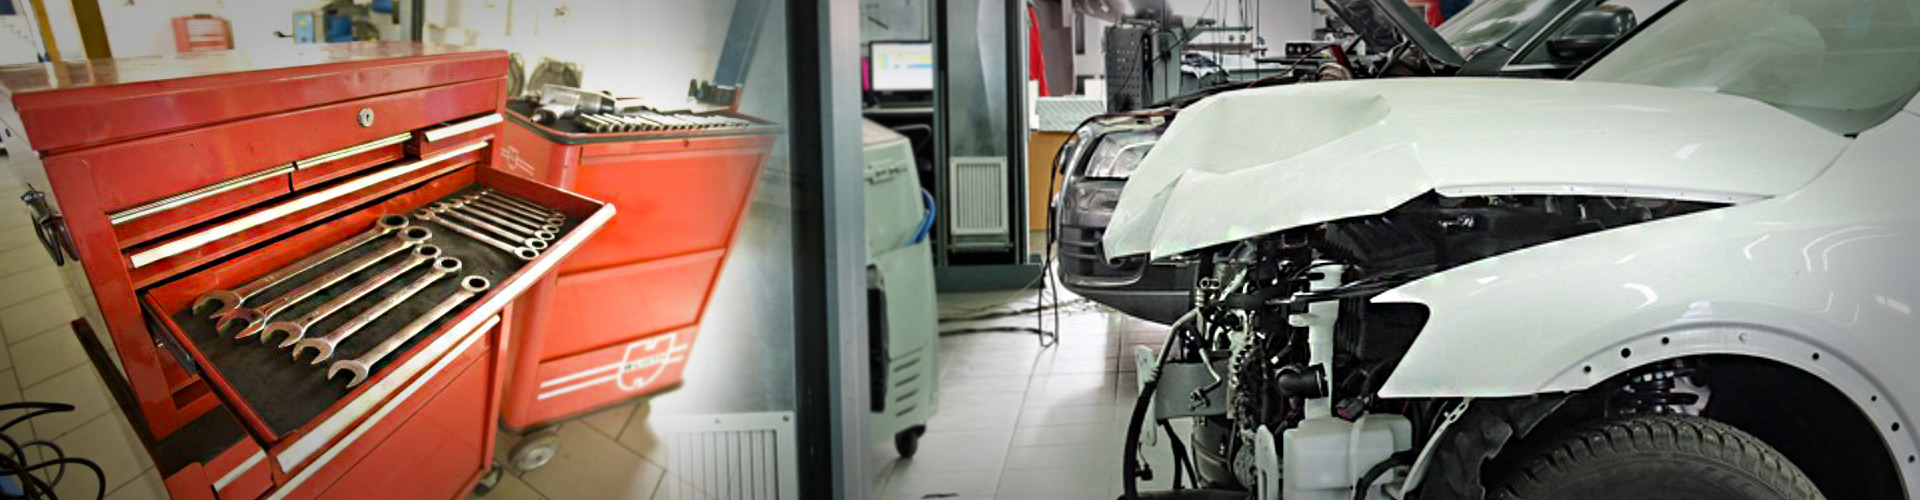 Unfallinstandsetzung Karosserieschaden Schadensabwicklung Gutachter Ersatzfahrzeug